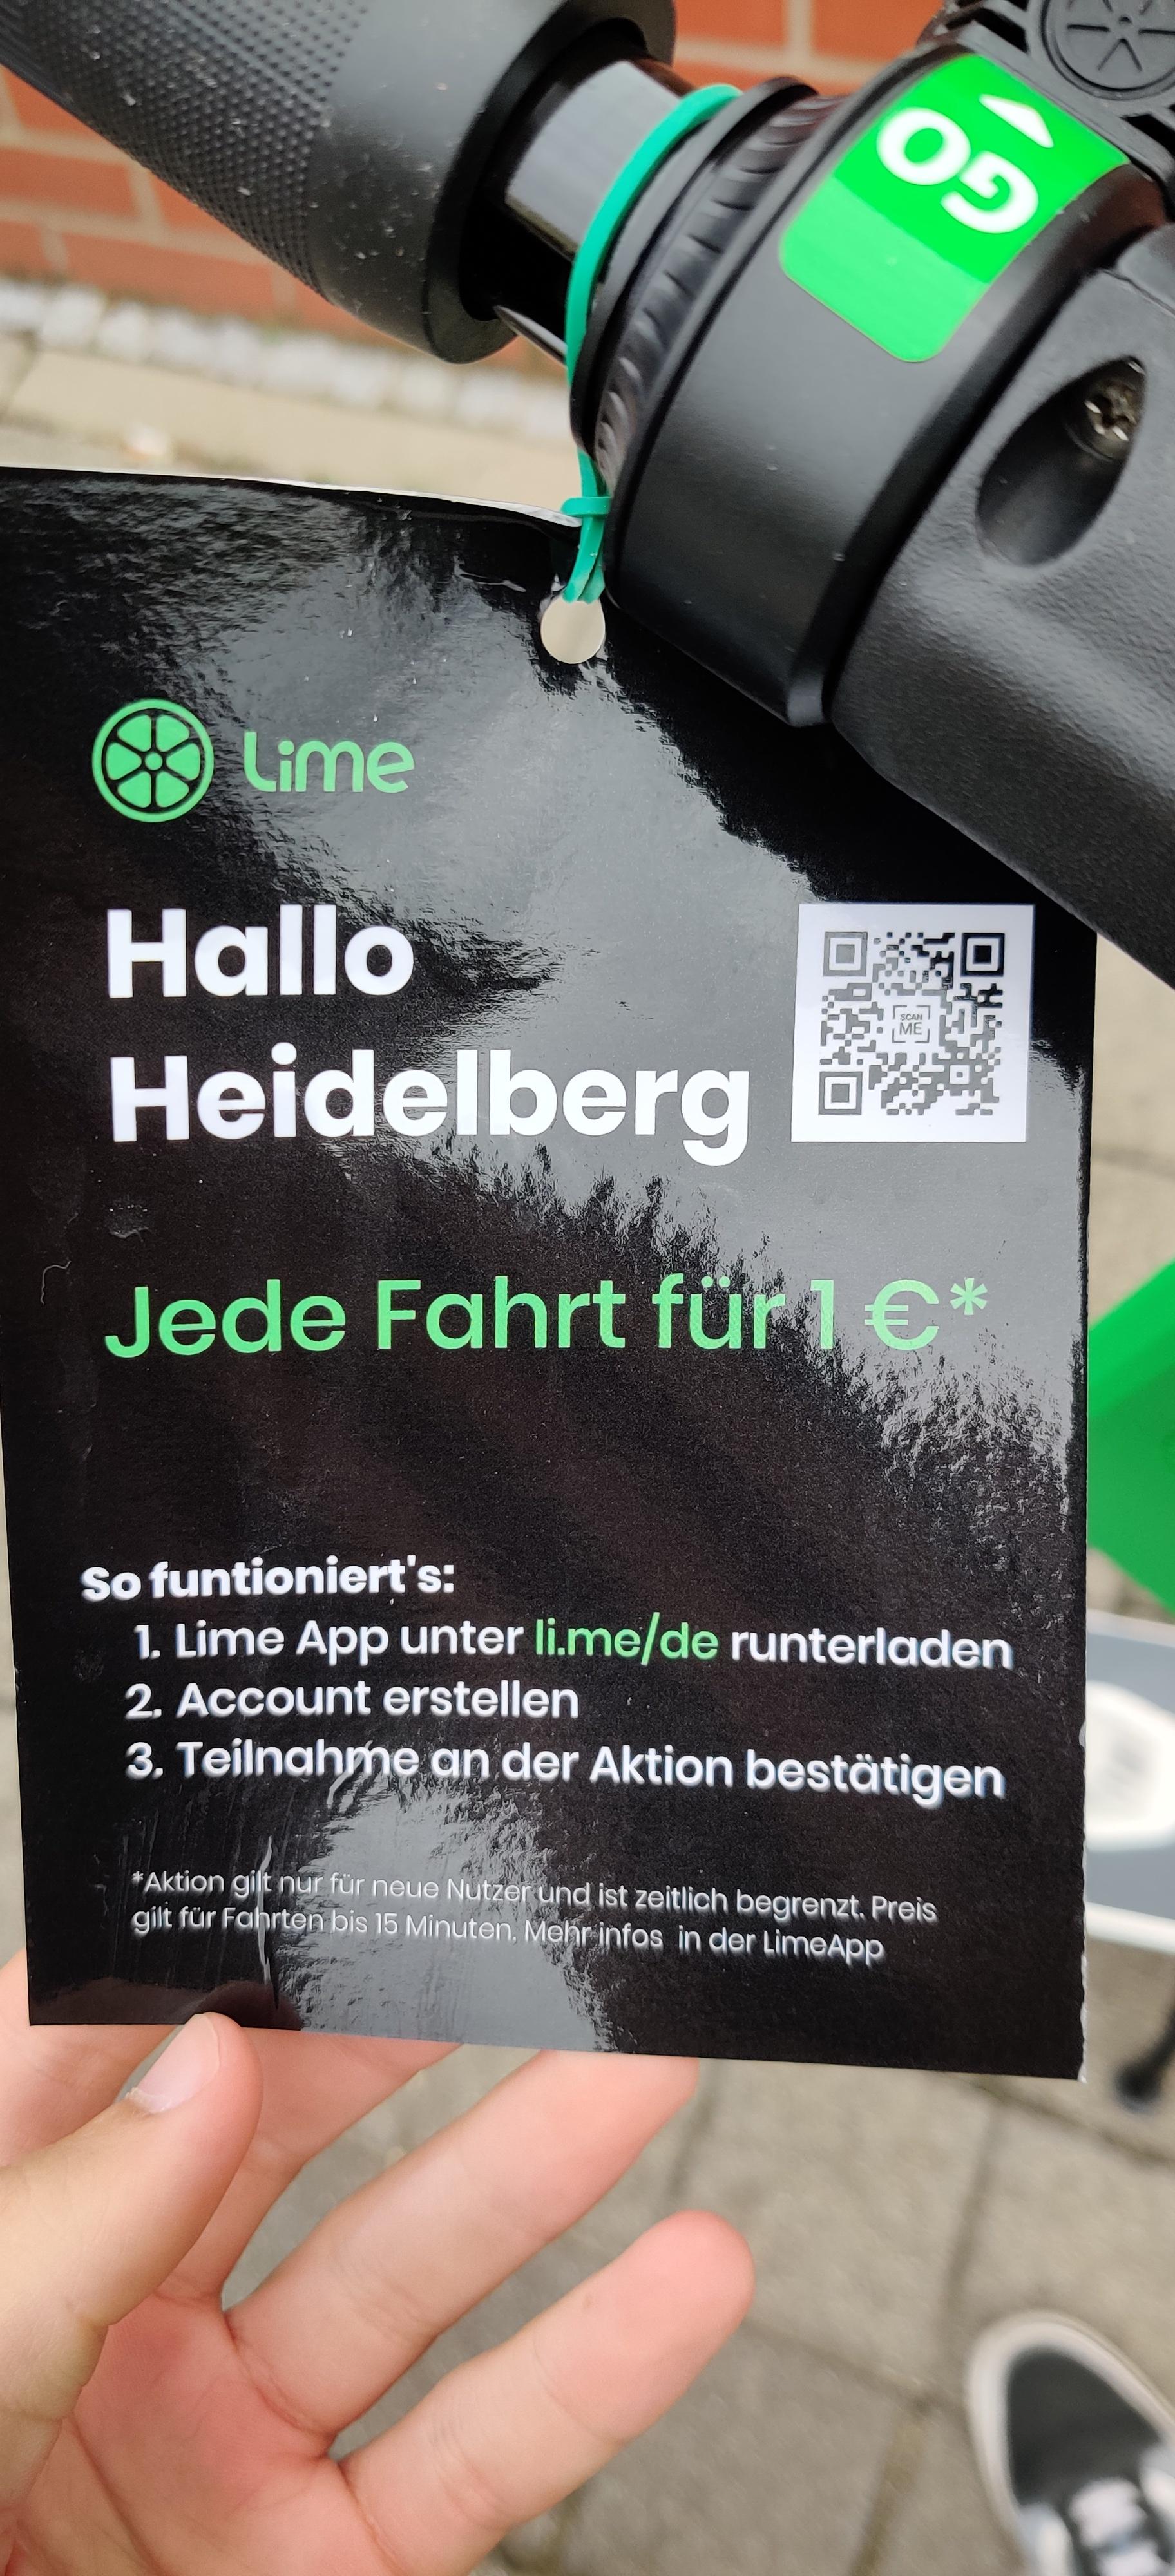 Heidelberg Lime E-Scooter 1€ pro Fahrt~15min (Neukunden)